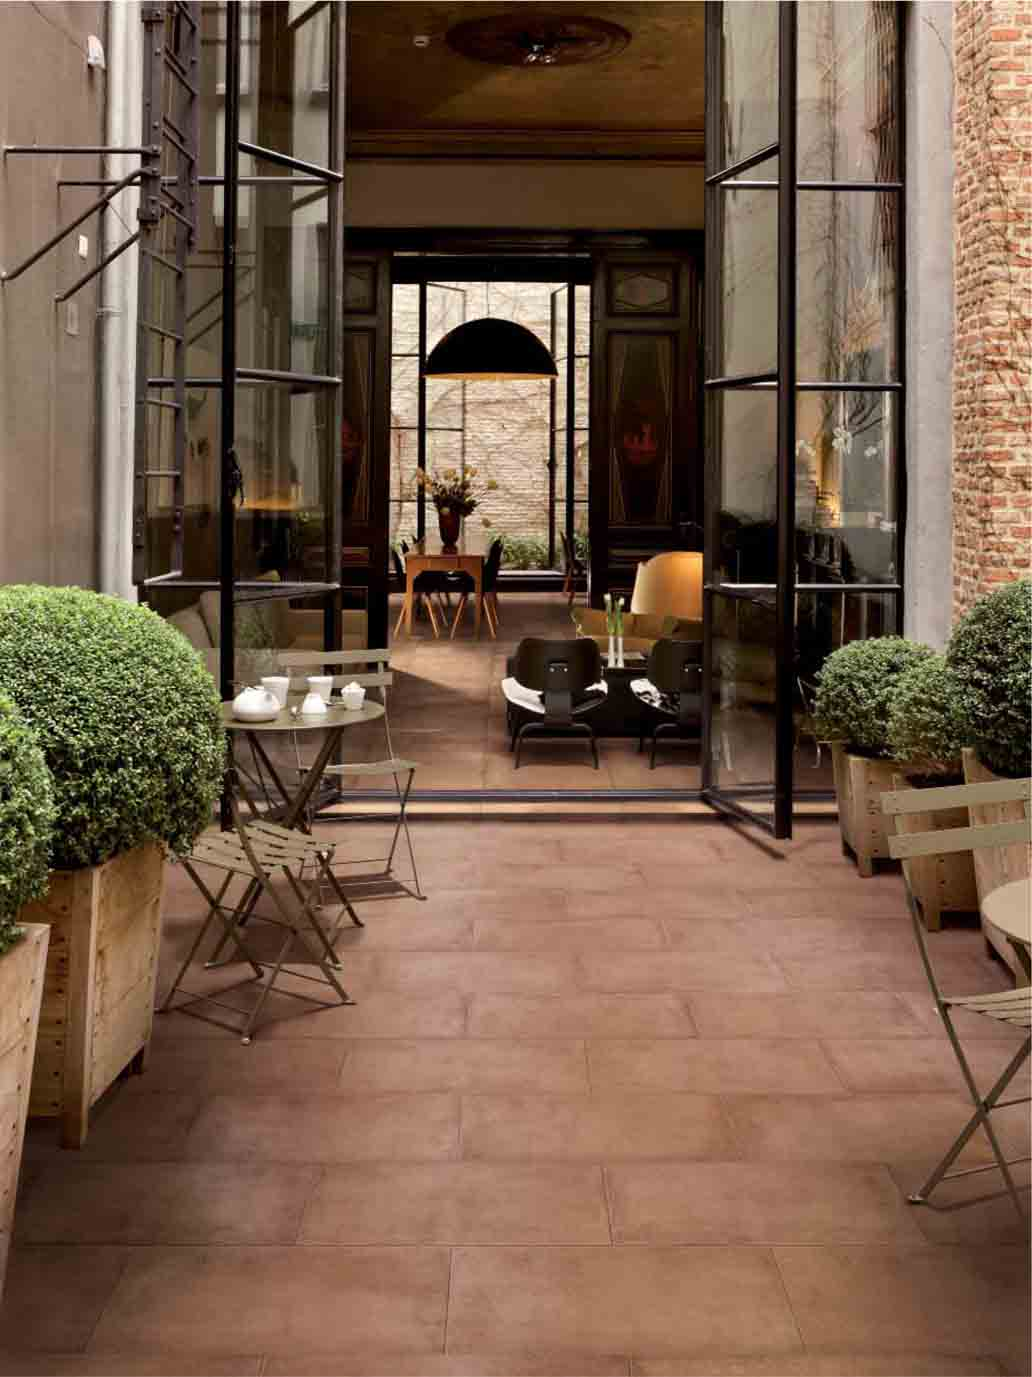 Carrelage terrasse - STYLE TERRE CUITE | Espace Quintane